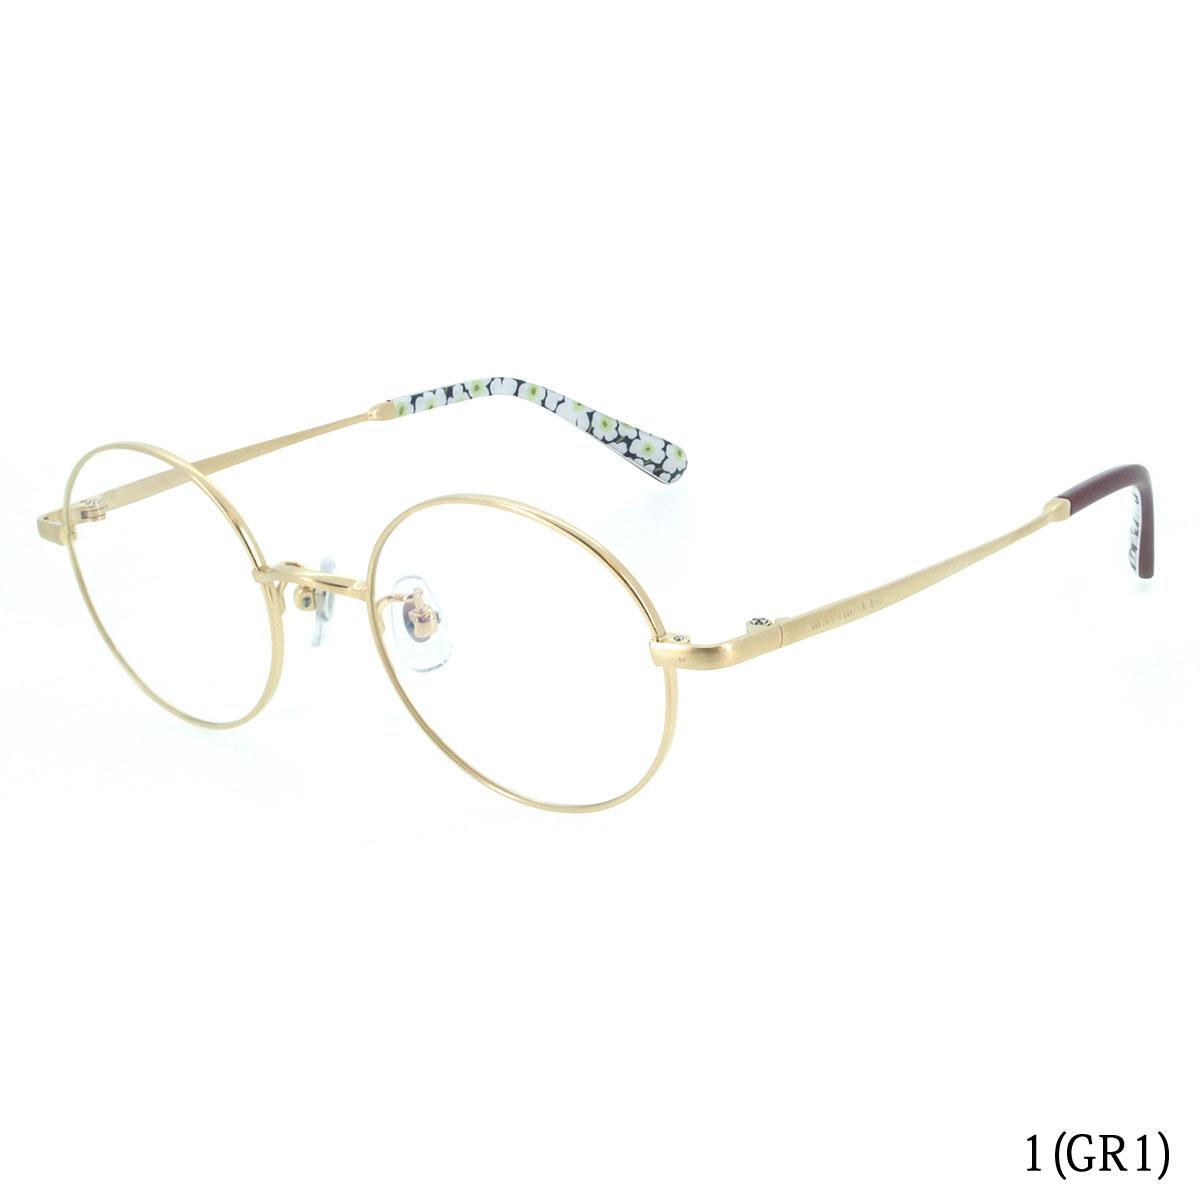 marimekko マリメッコ MINI UNIKKO ミニウニッコ 32-0025 メガネ/めがね/眼鏡/度付きメガネ/度入り/伊達メガネ